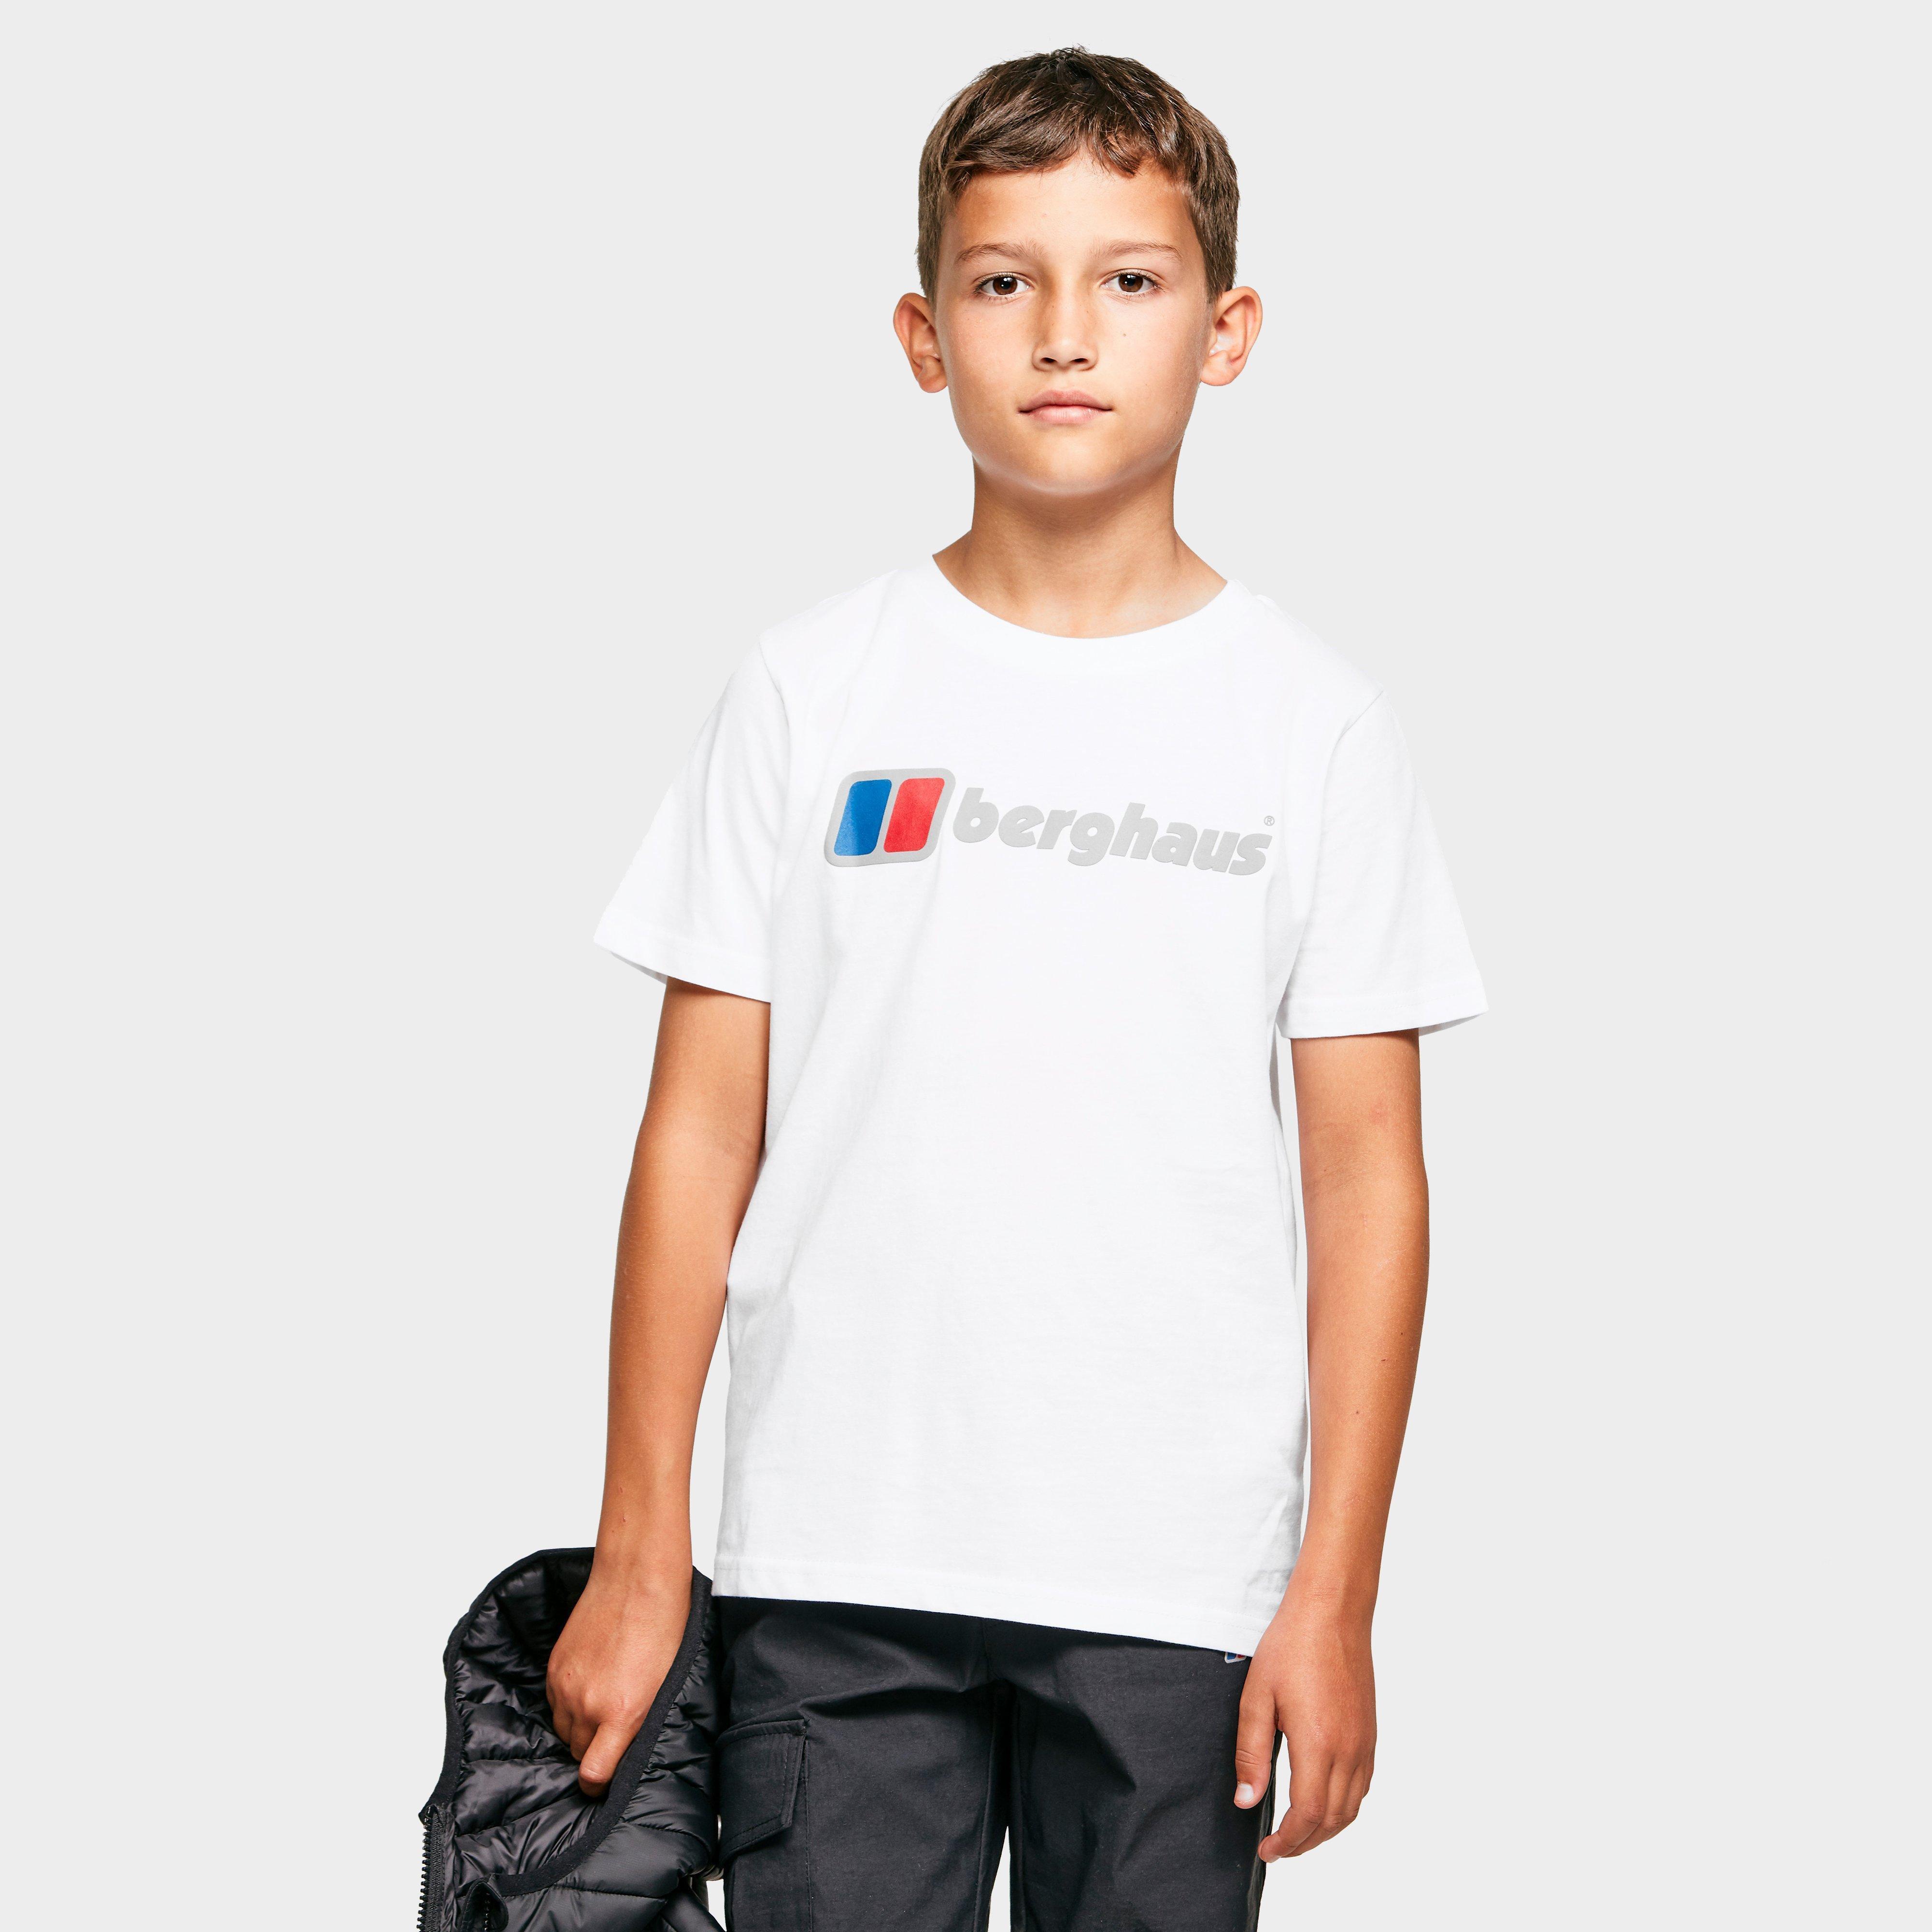 Berghaus Kids Logo T-shirt - White  White